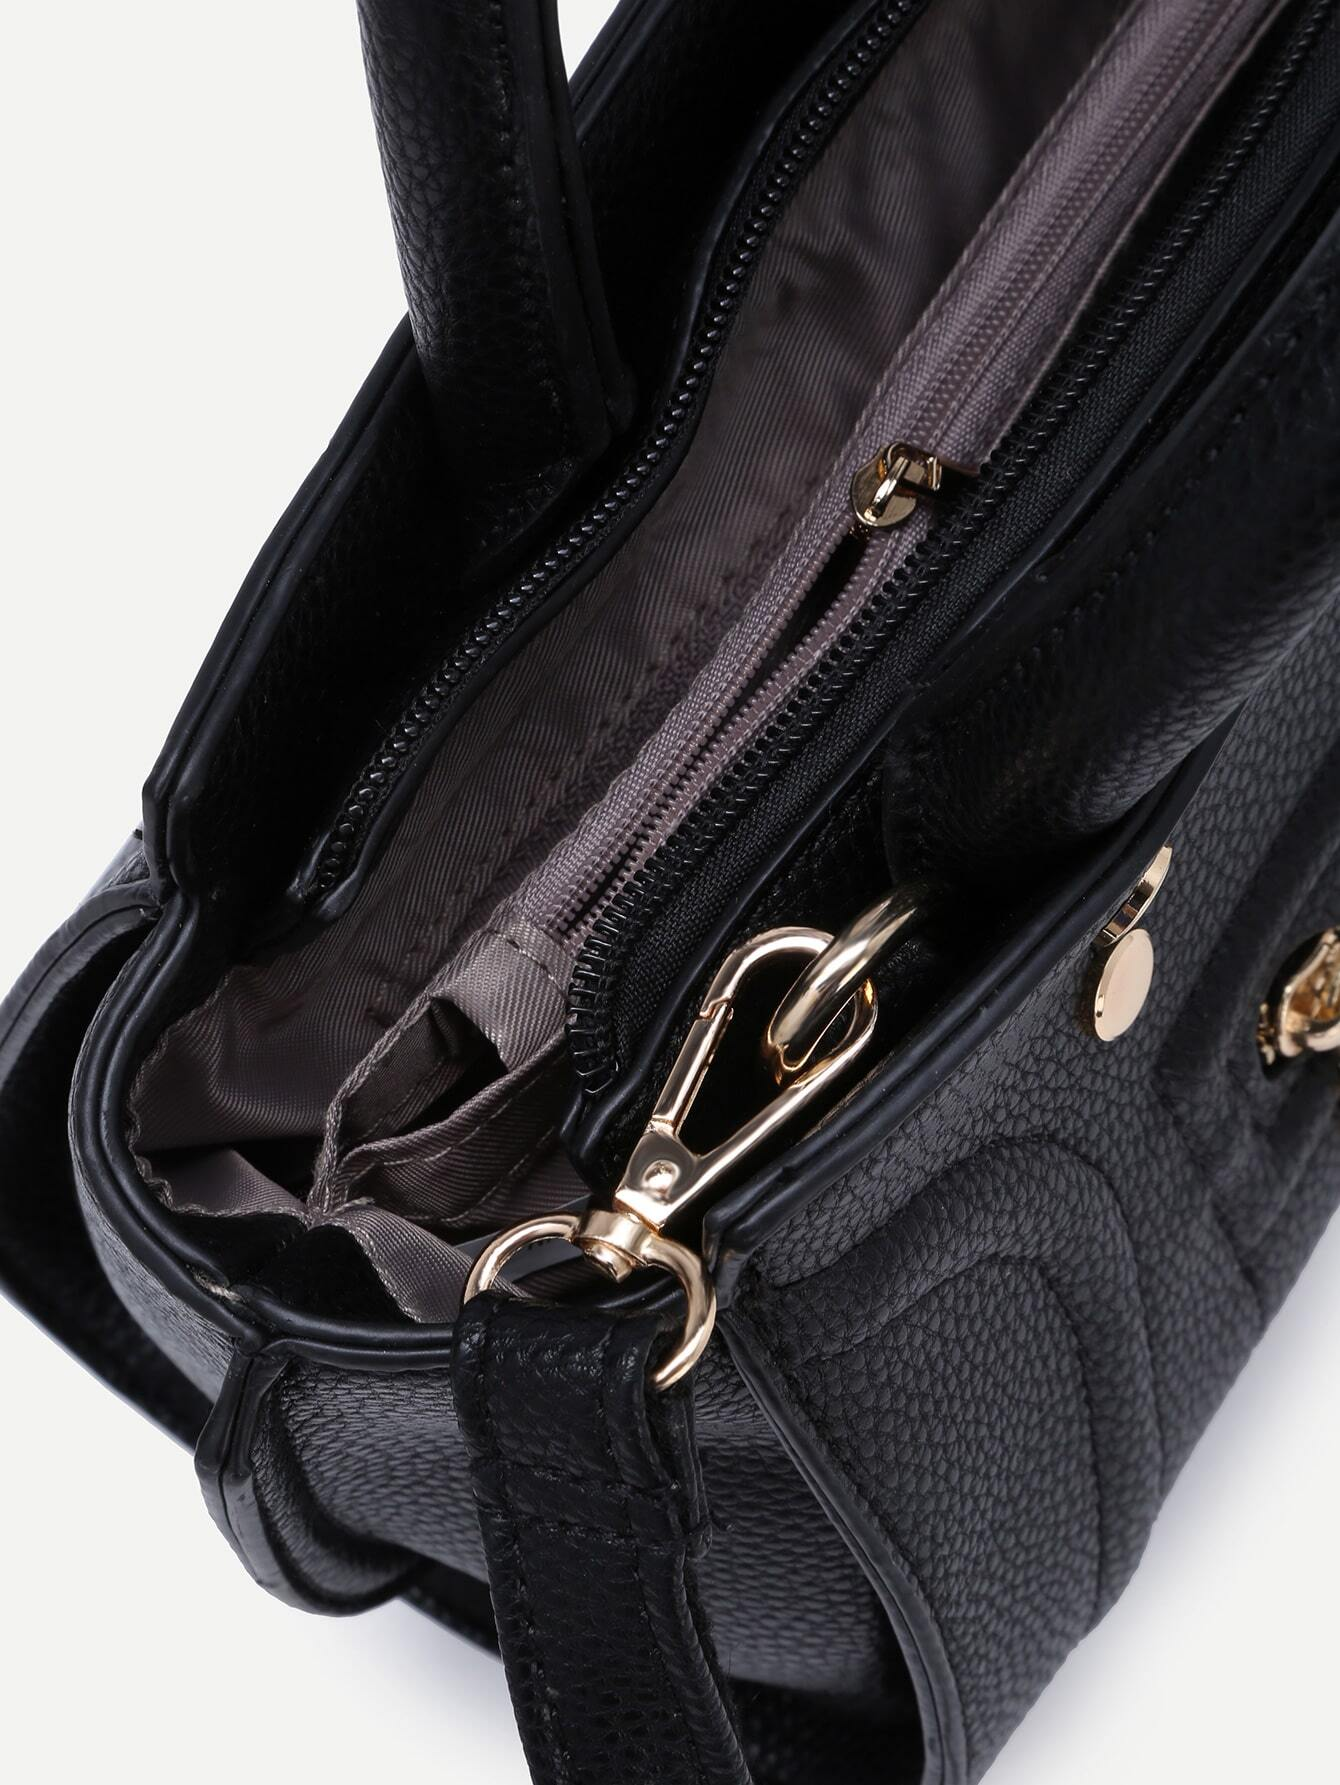 bag160826912_2